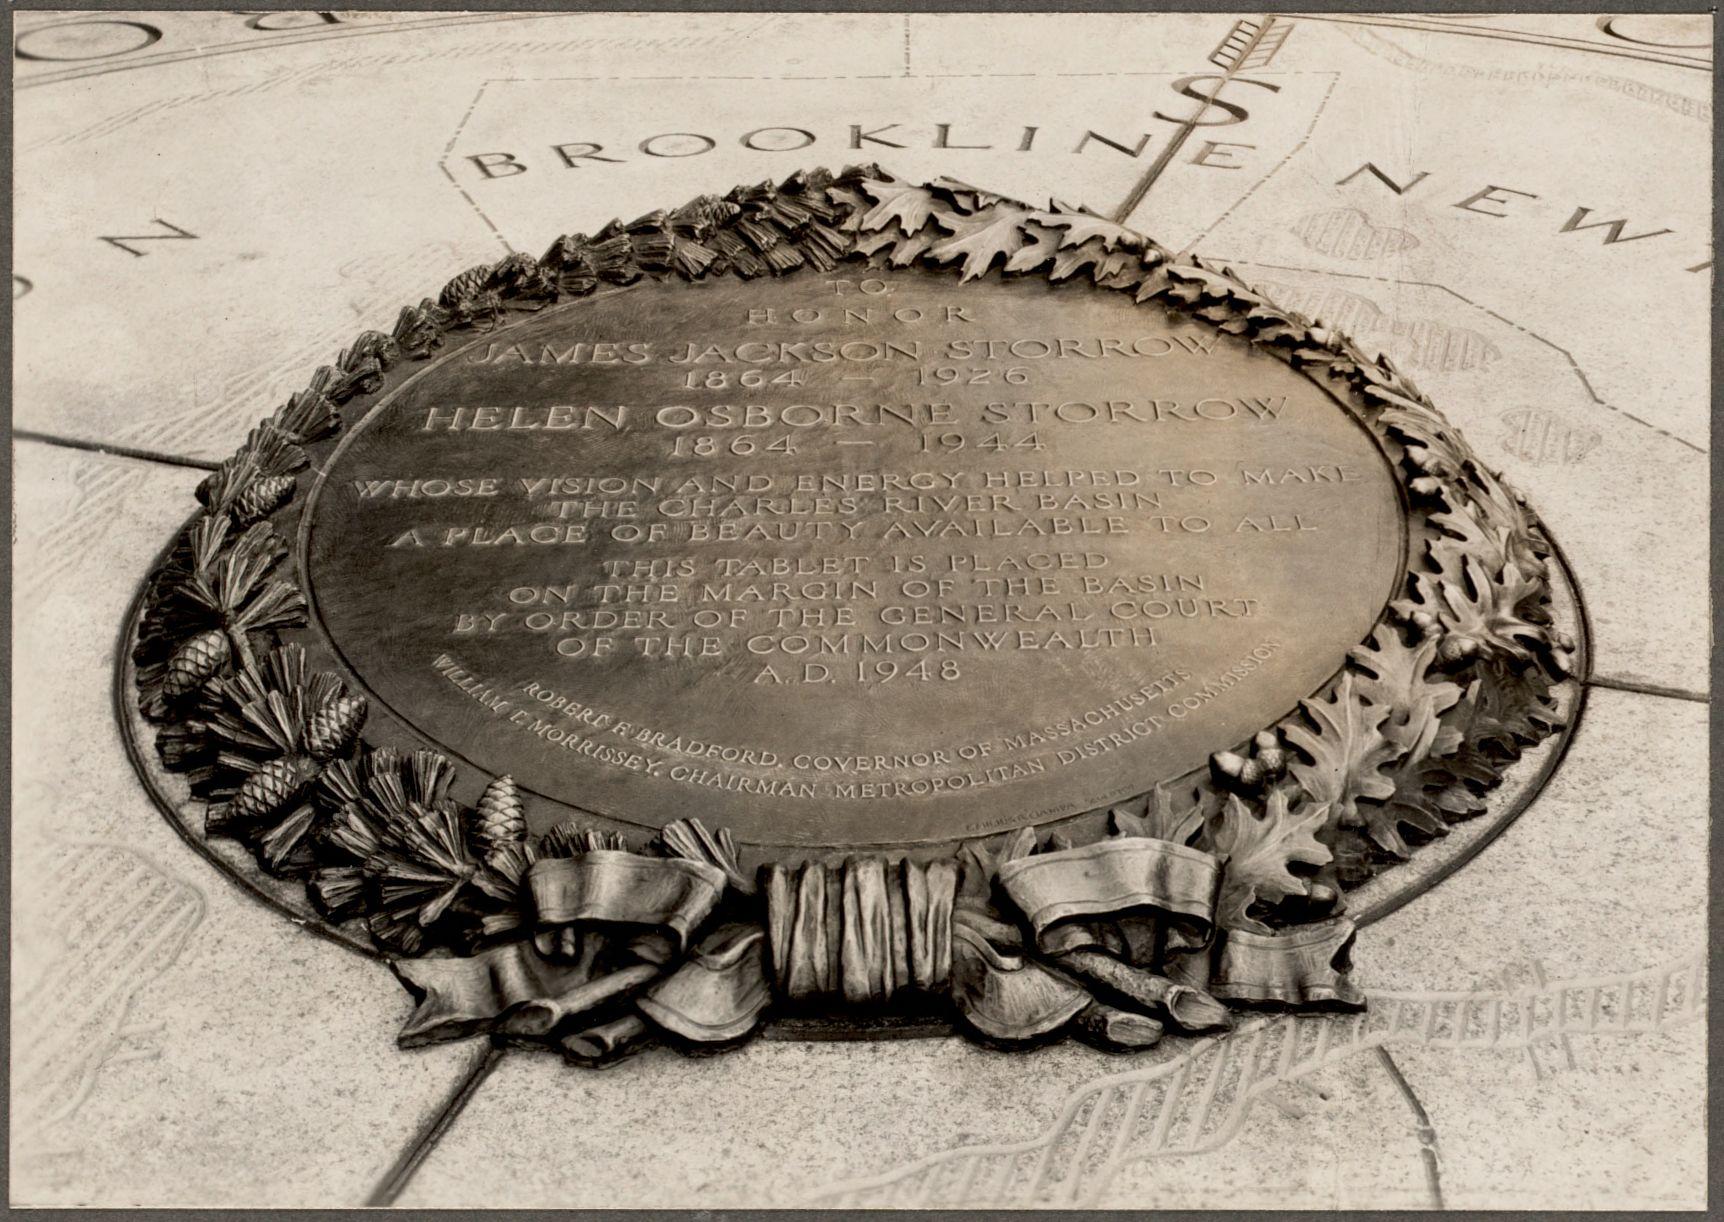 """Dedication of the James Jackson Storrow and Helen Osborn Storrow Memorial, Gloucester Street - Storrow Memorial embankment, July 27, 1949."""